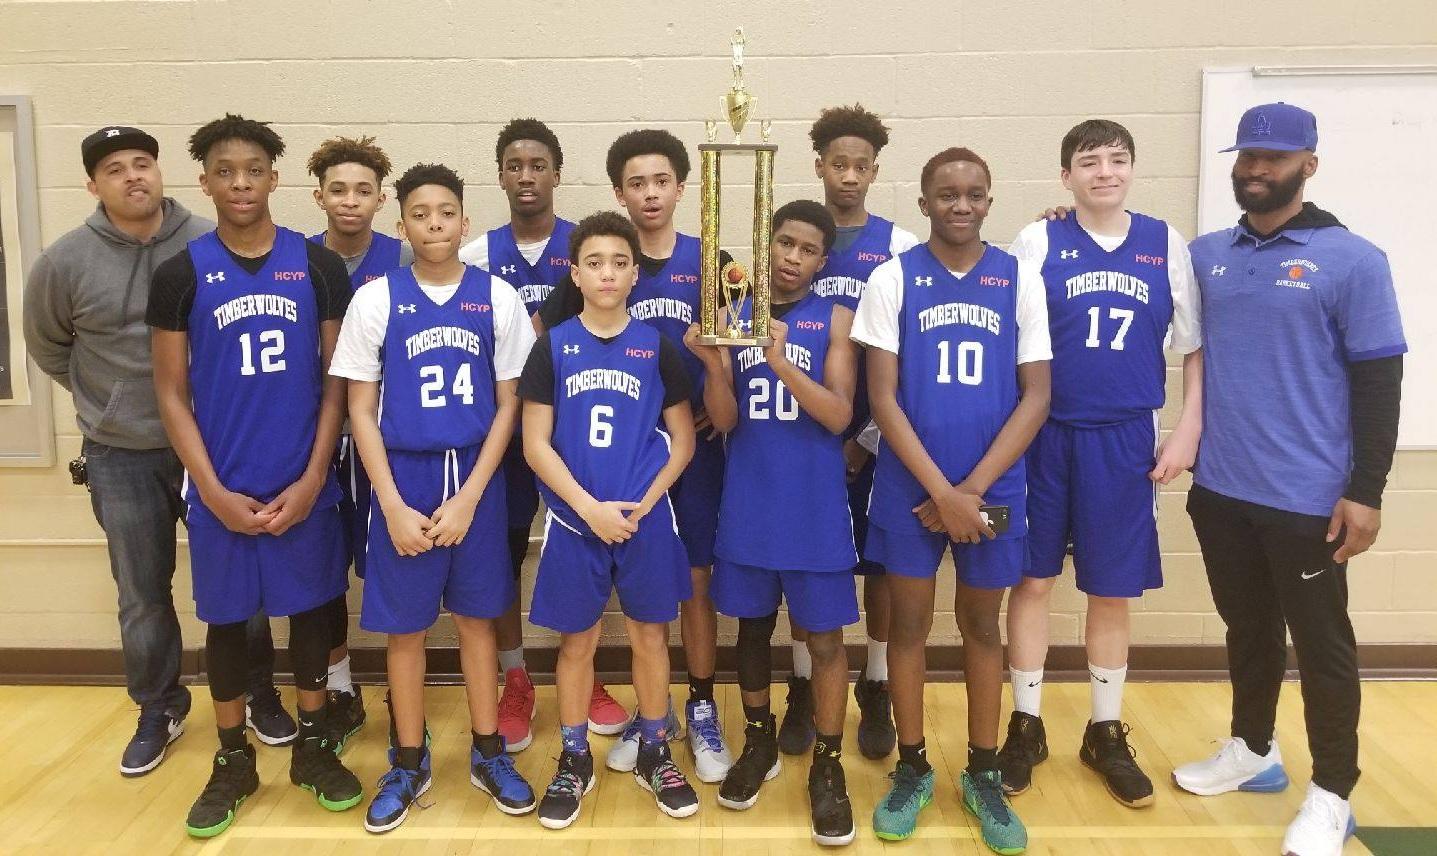 Thomas Viaduct Middle School HCYP Boys Varsity MS Champions 2019!